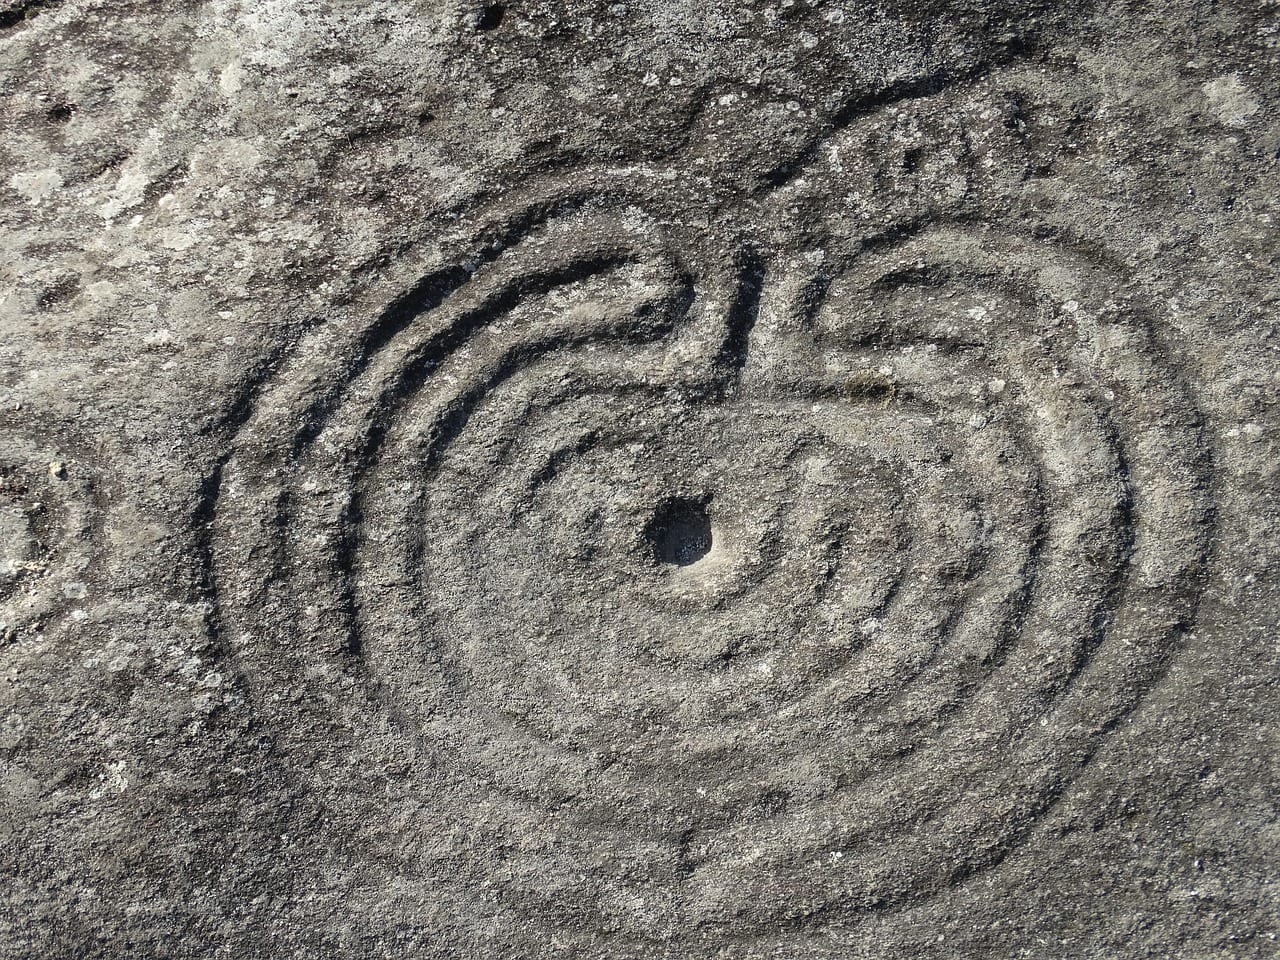 Petroglifos Mogor Pontevedra España